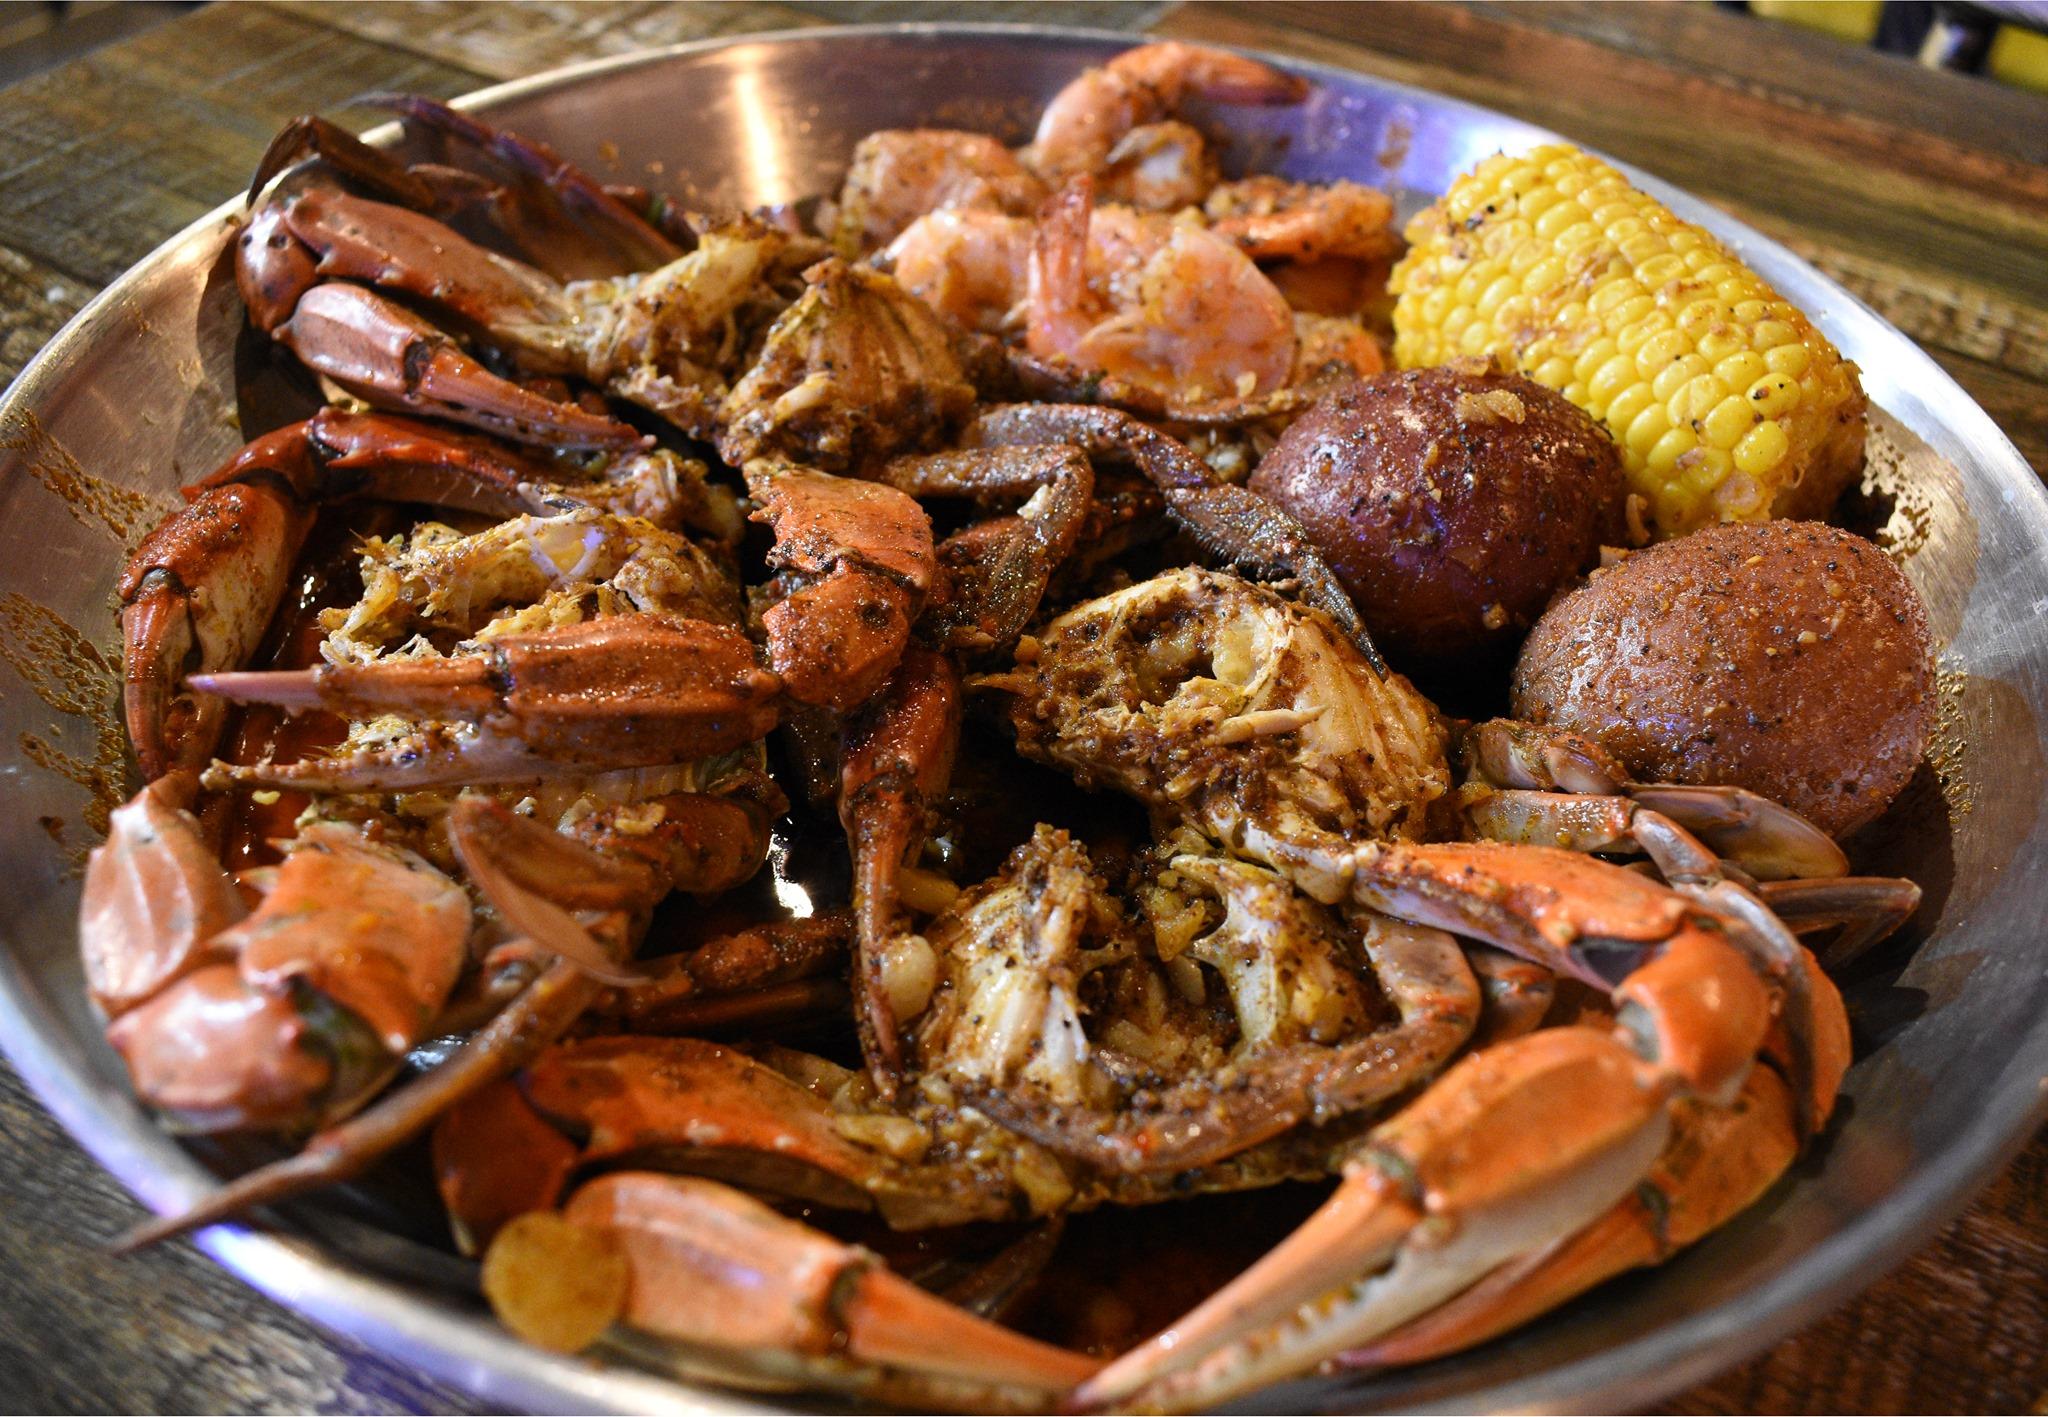 Boiled crab, potatoes, shrimp, and corn